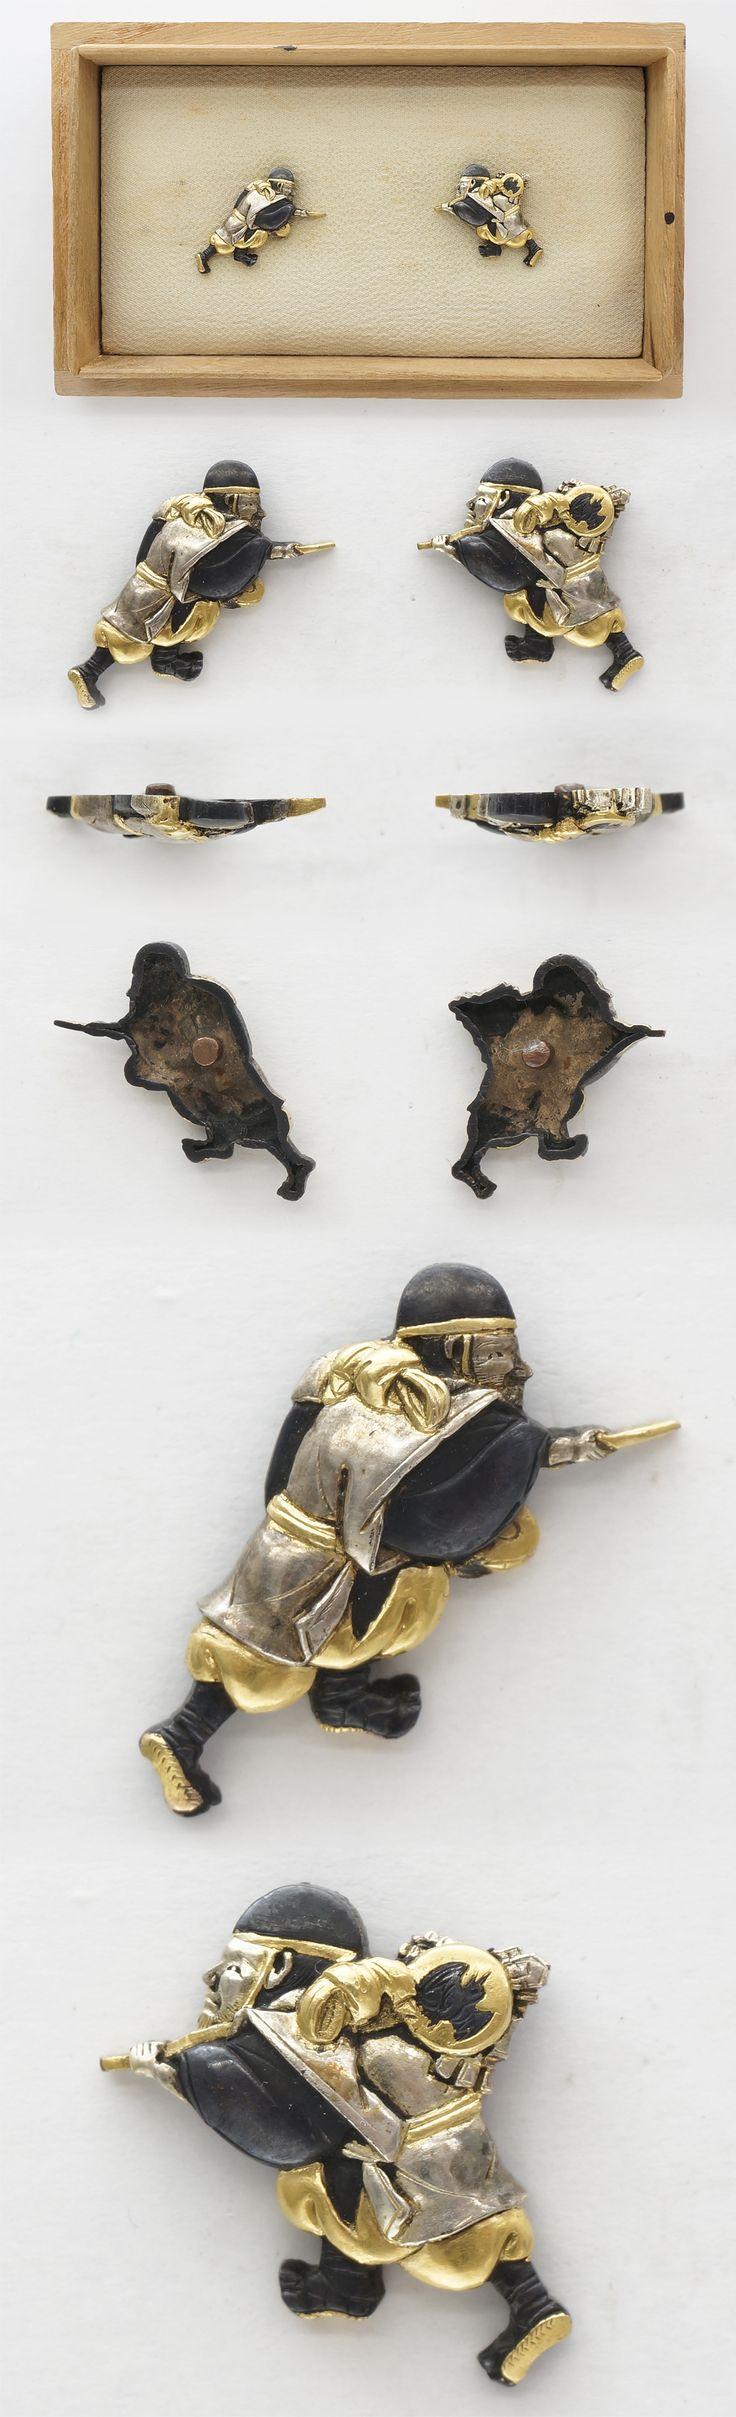 Menuki : mumei street performers | Japanese Sword Shop Aoi-Art.